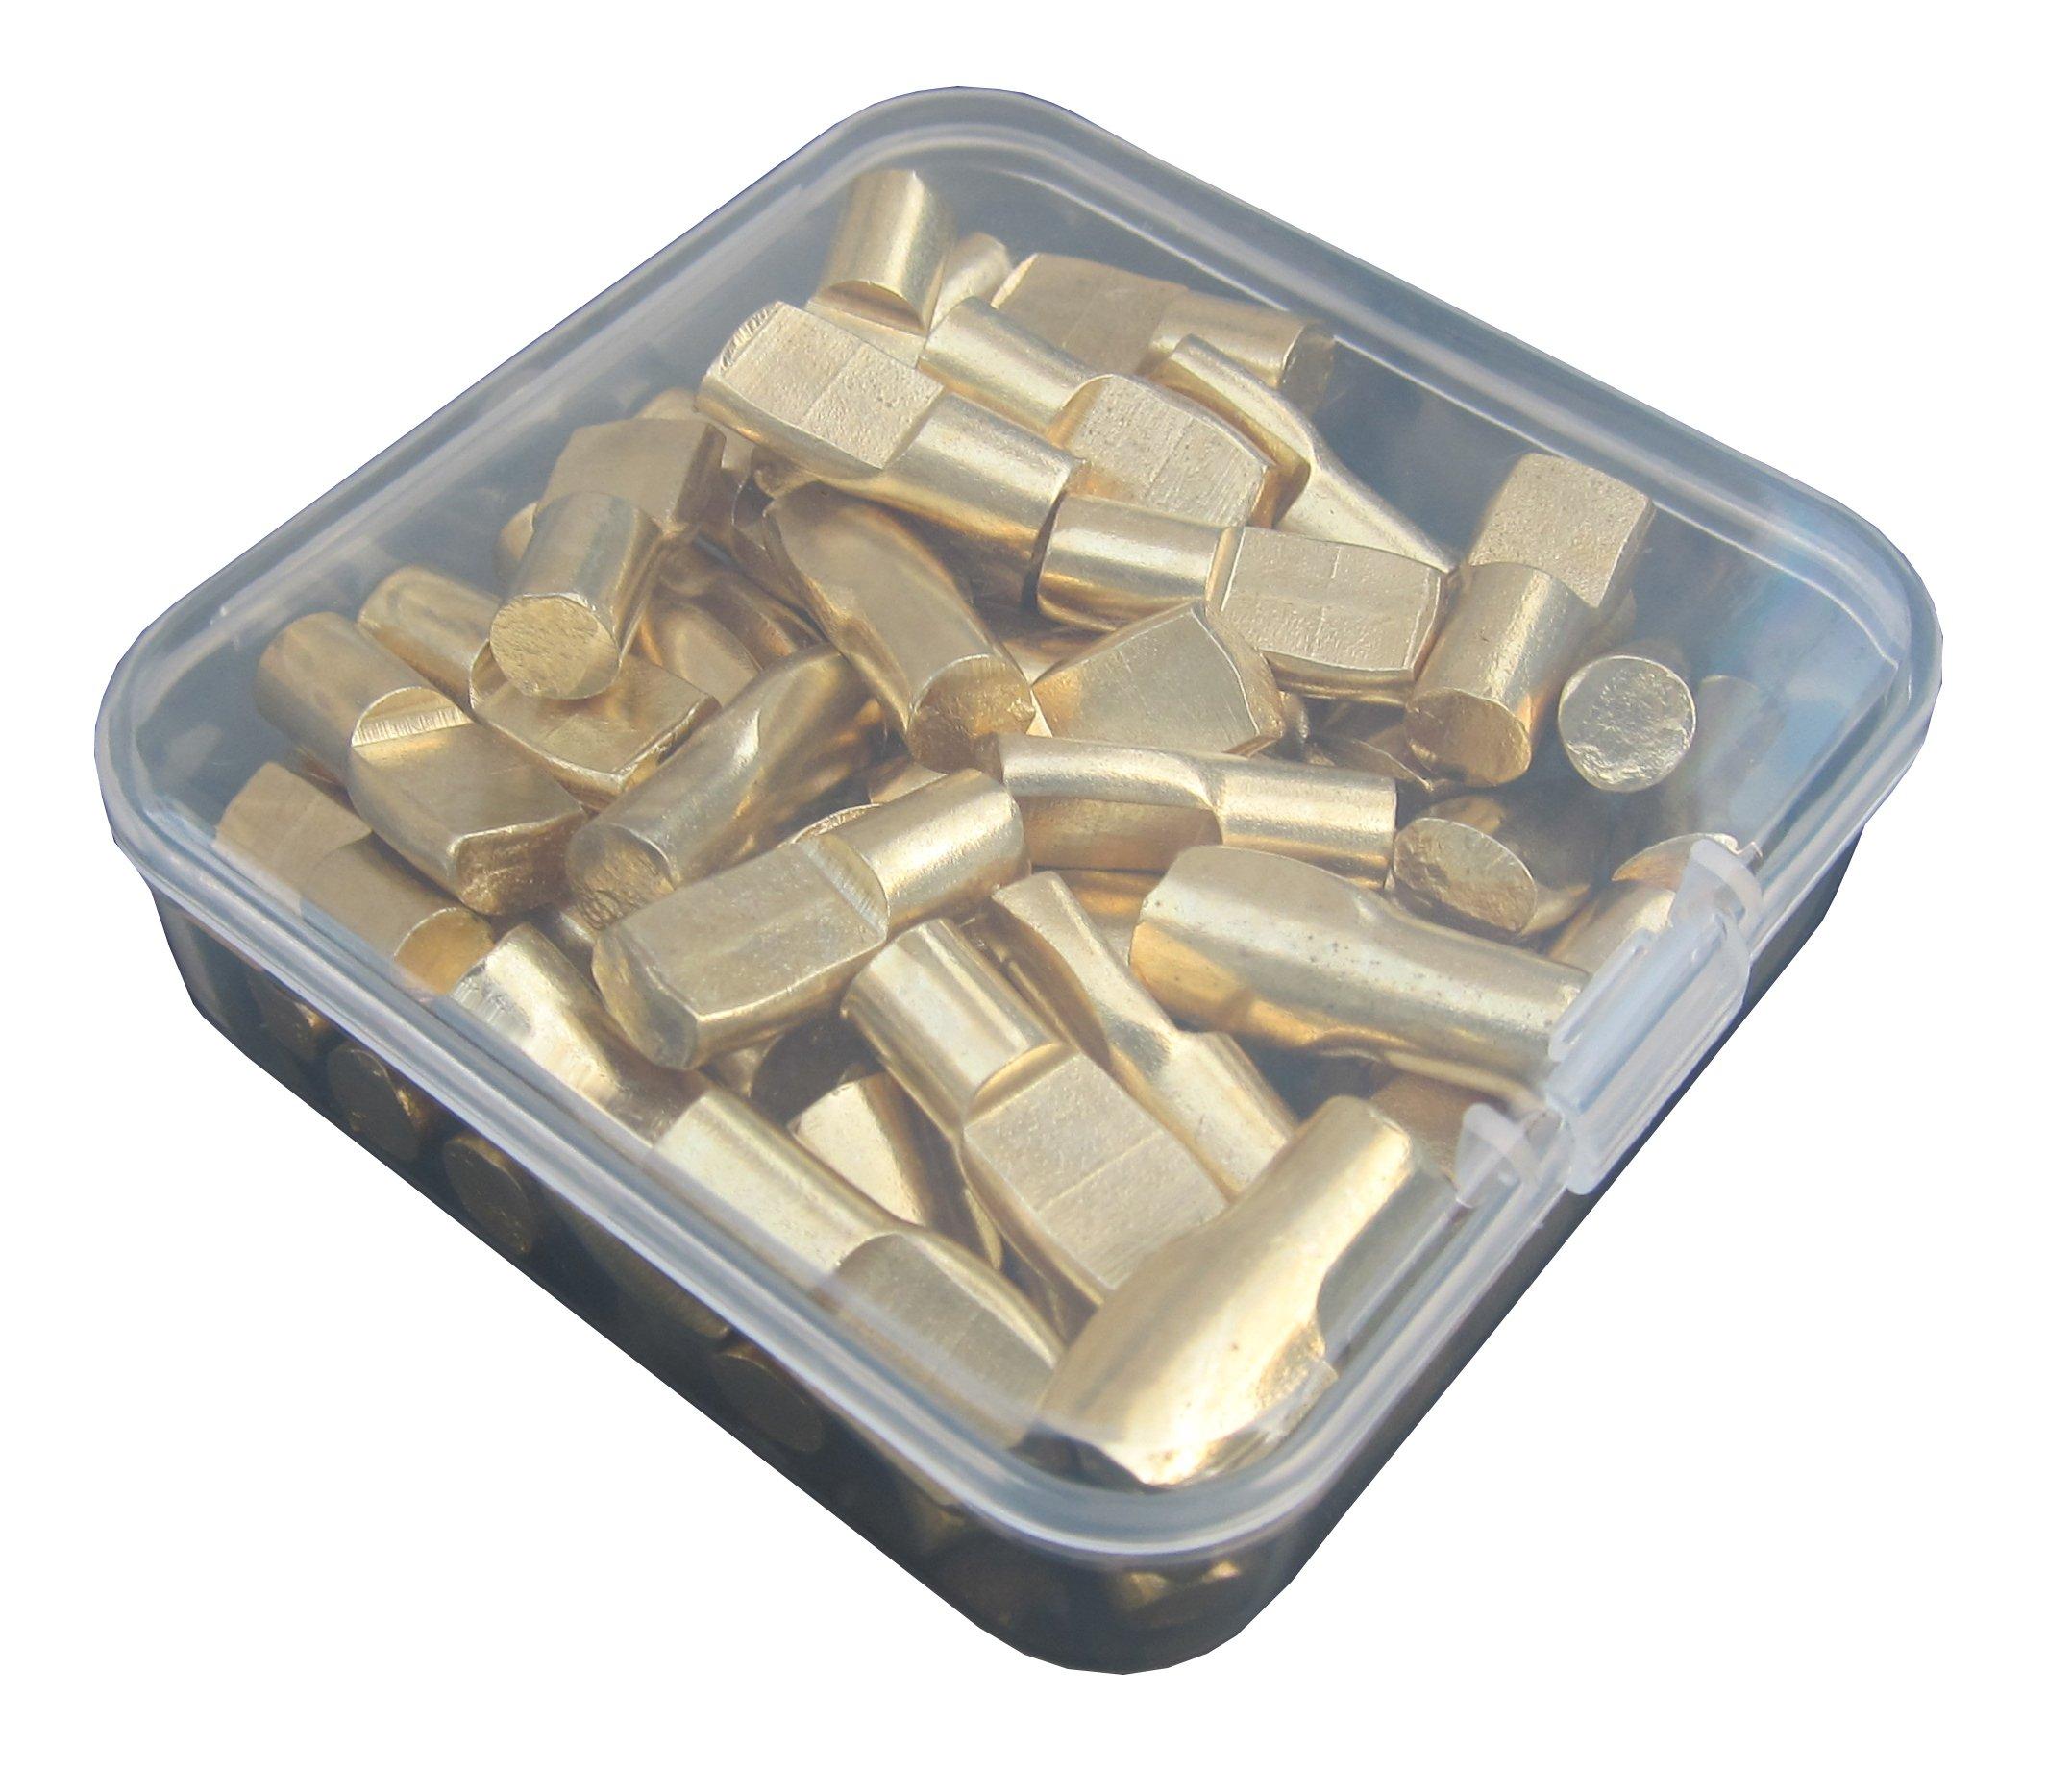 1/4-Inch Spoon Shape Shelf Rests 60Piece Set, Furniture Cabinet Closet Shelf Pegs, in Storage Box, 60-Pack (Brass)